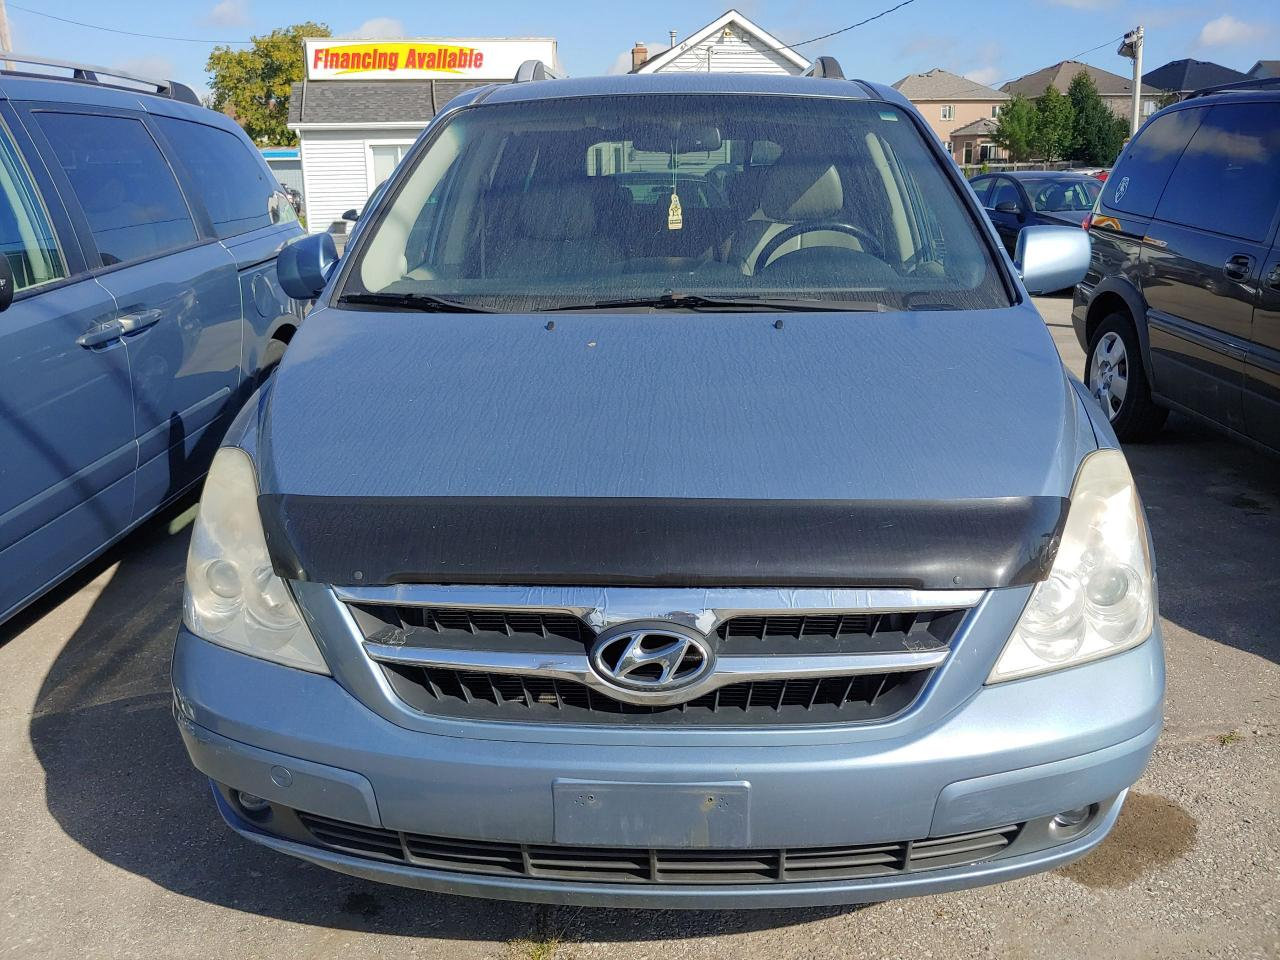 2007 Hyundai Entourage GLS w/Leather